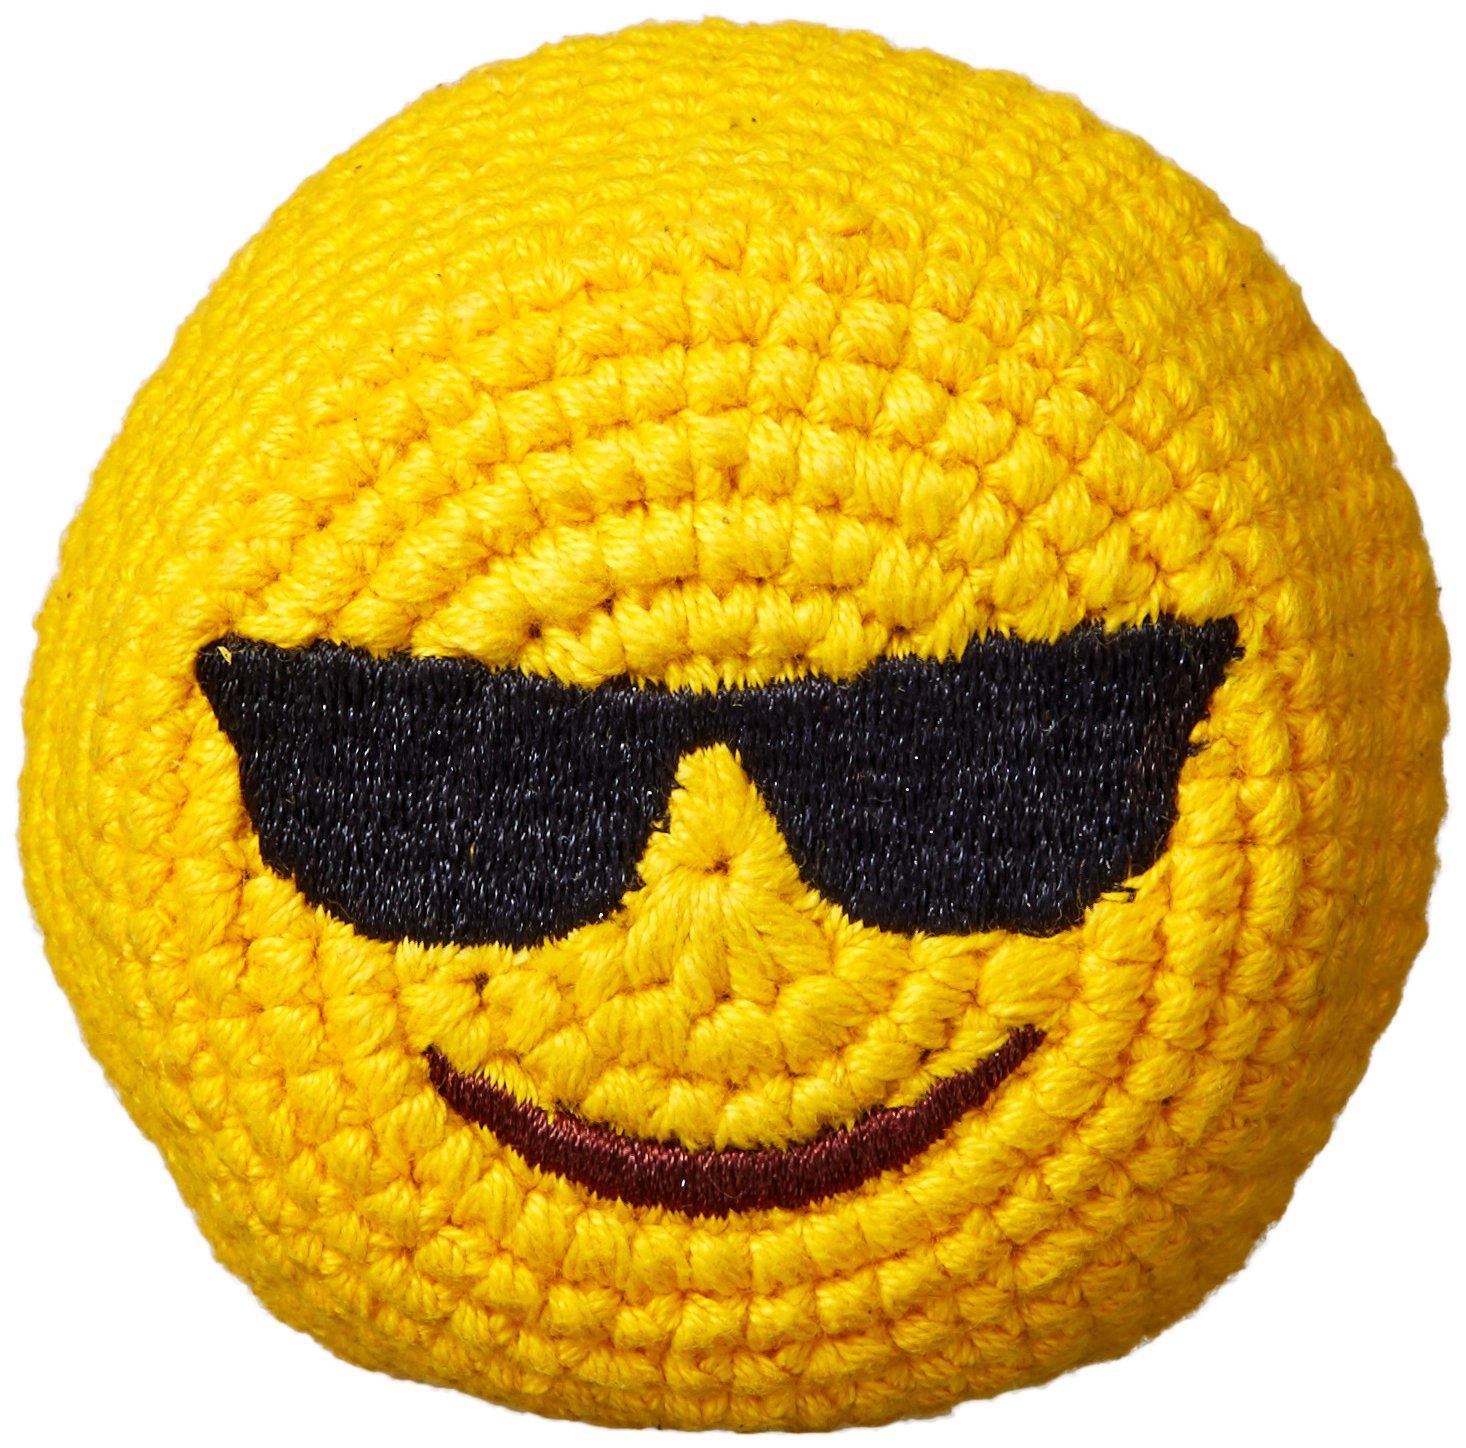 Emoji Footbag Hacky Sack - Sunglasses Design